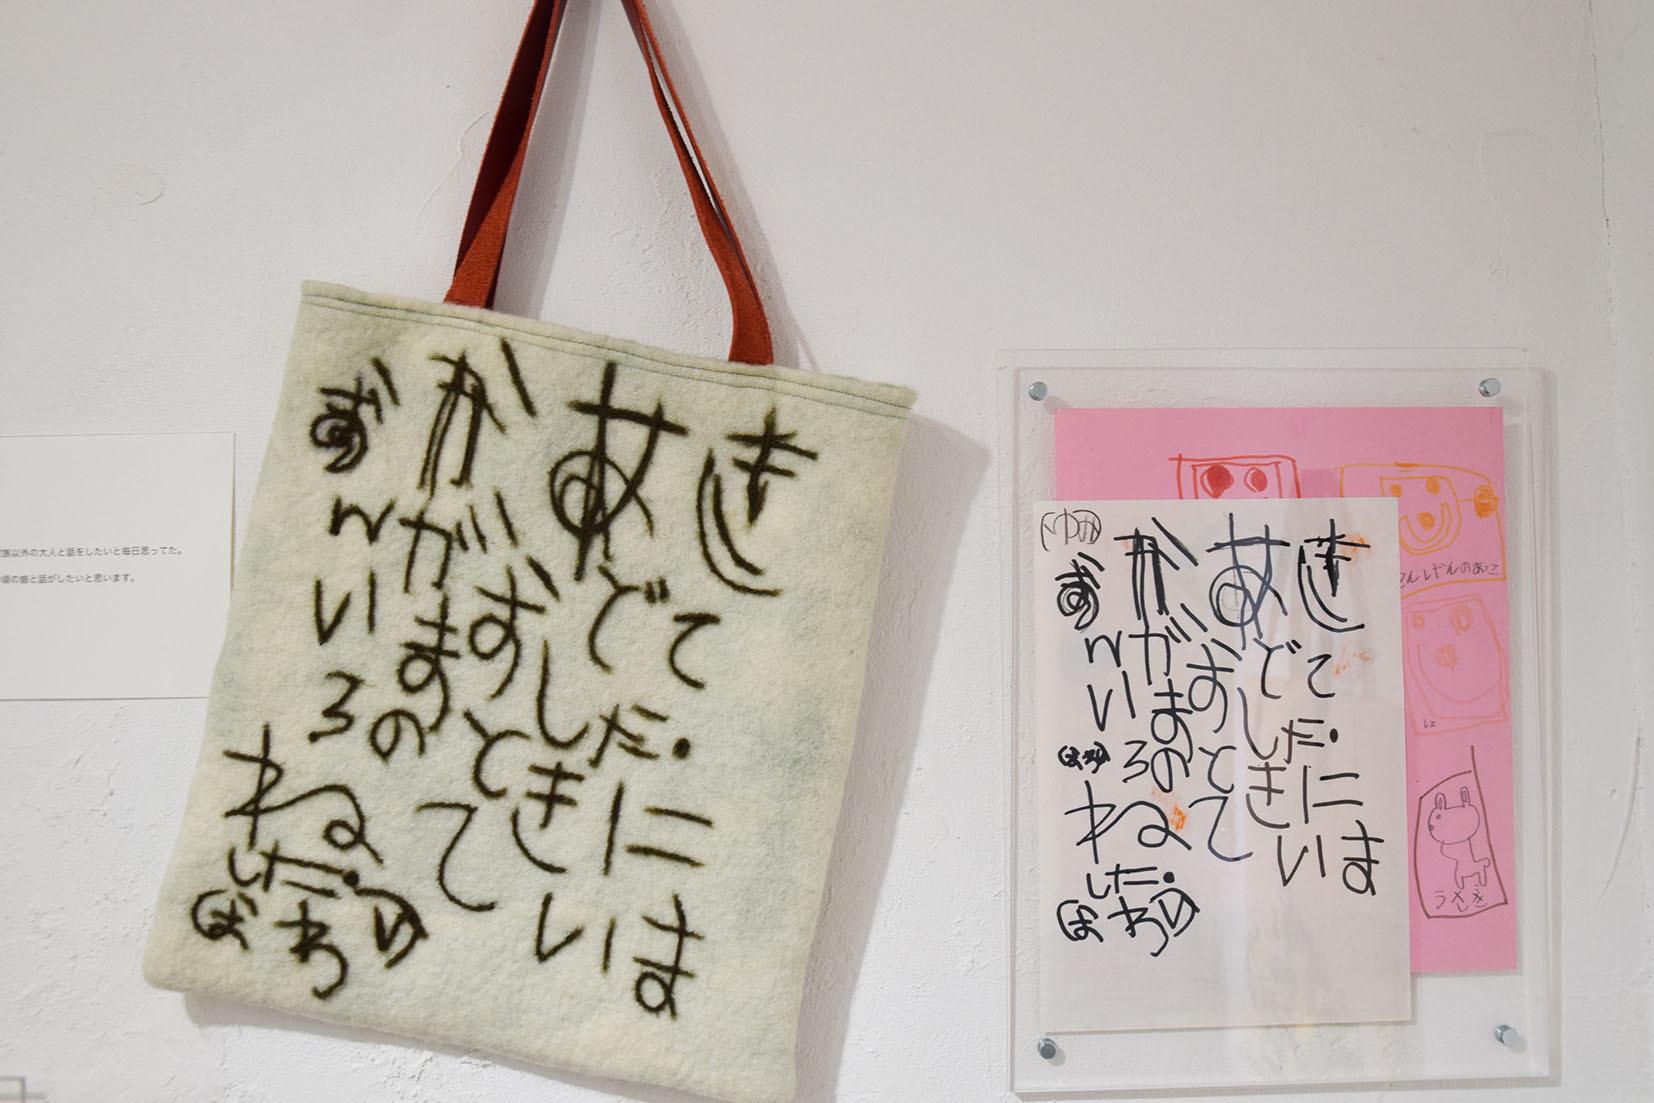 MOSAIC FELT Kokuga Rumi exhibition @ 3日目_e0272050_16511839.jpg